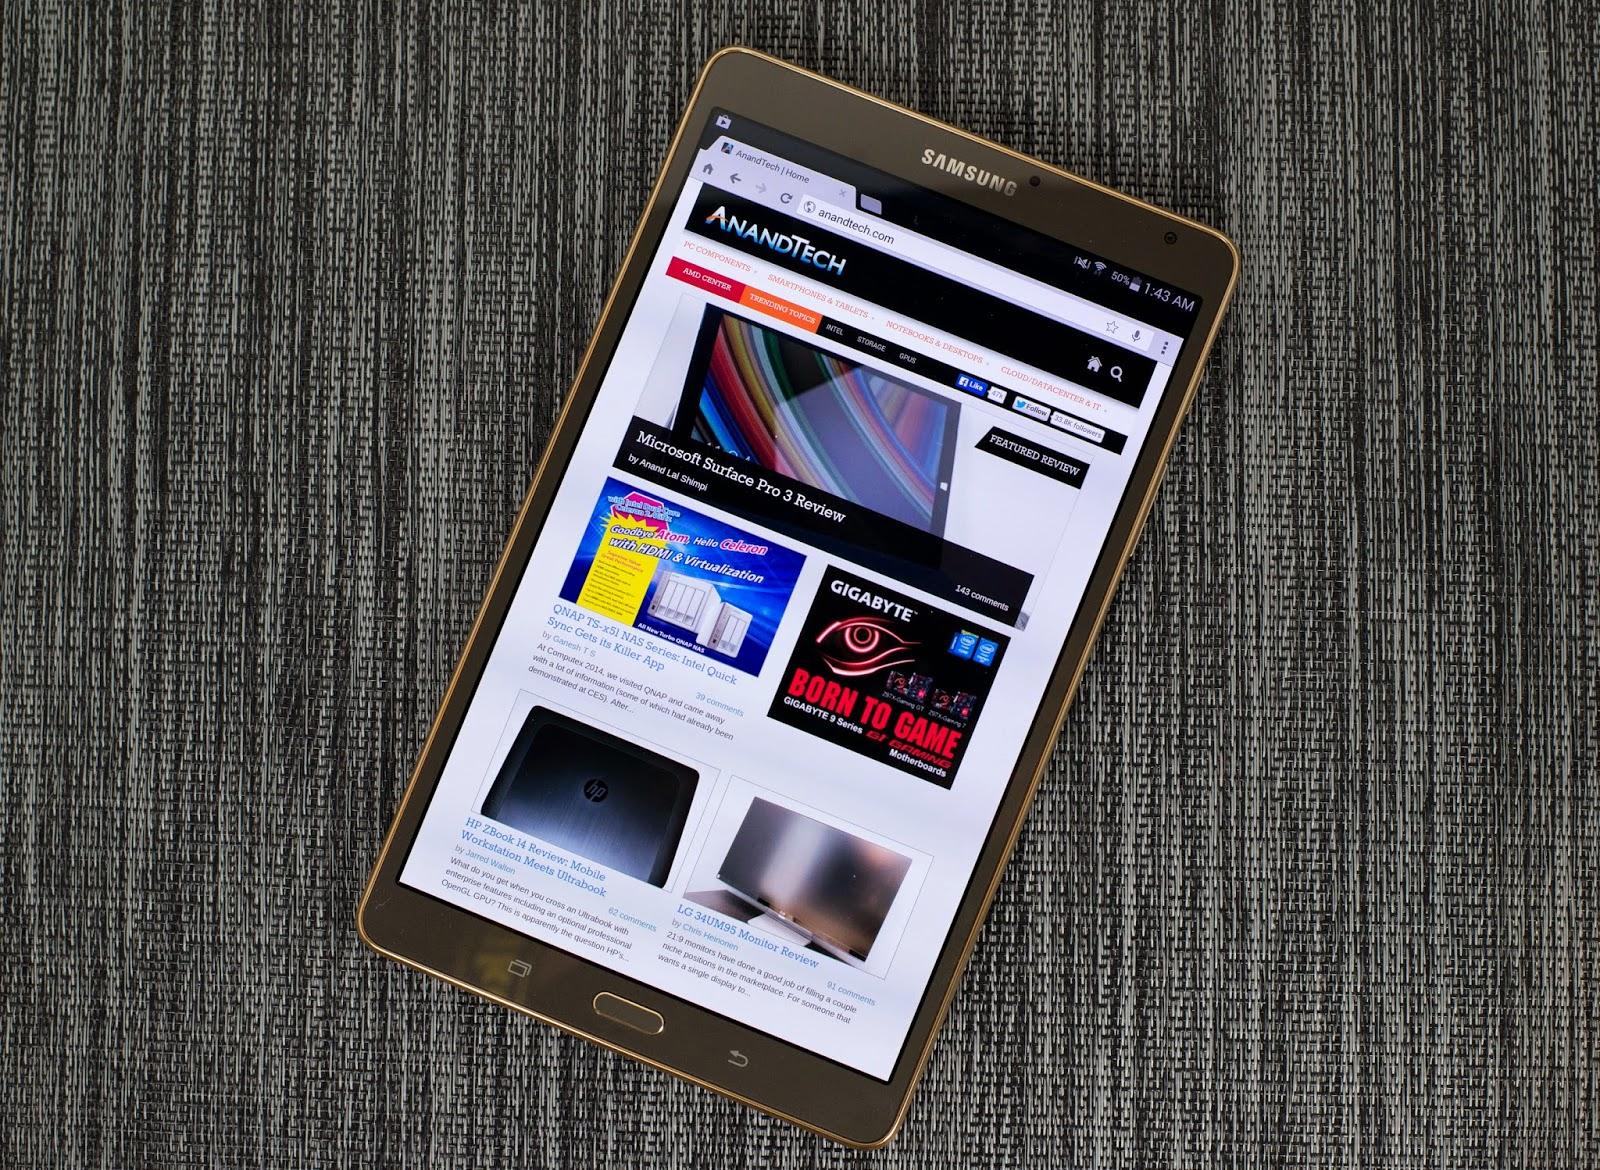 Samsung Galaxy Tab terbaru